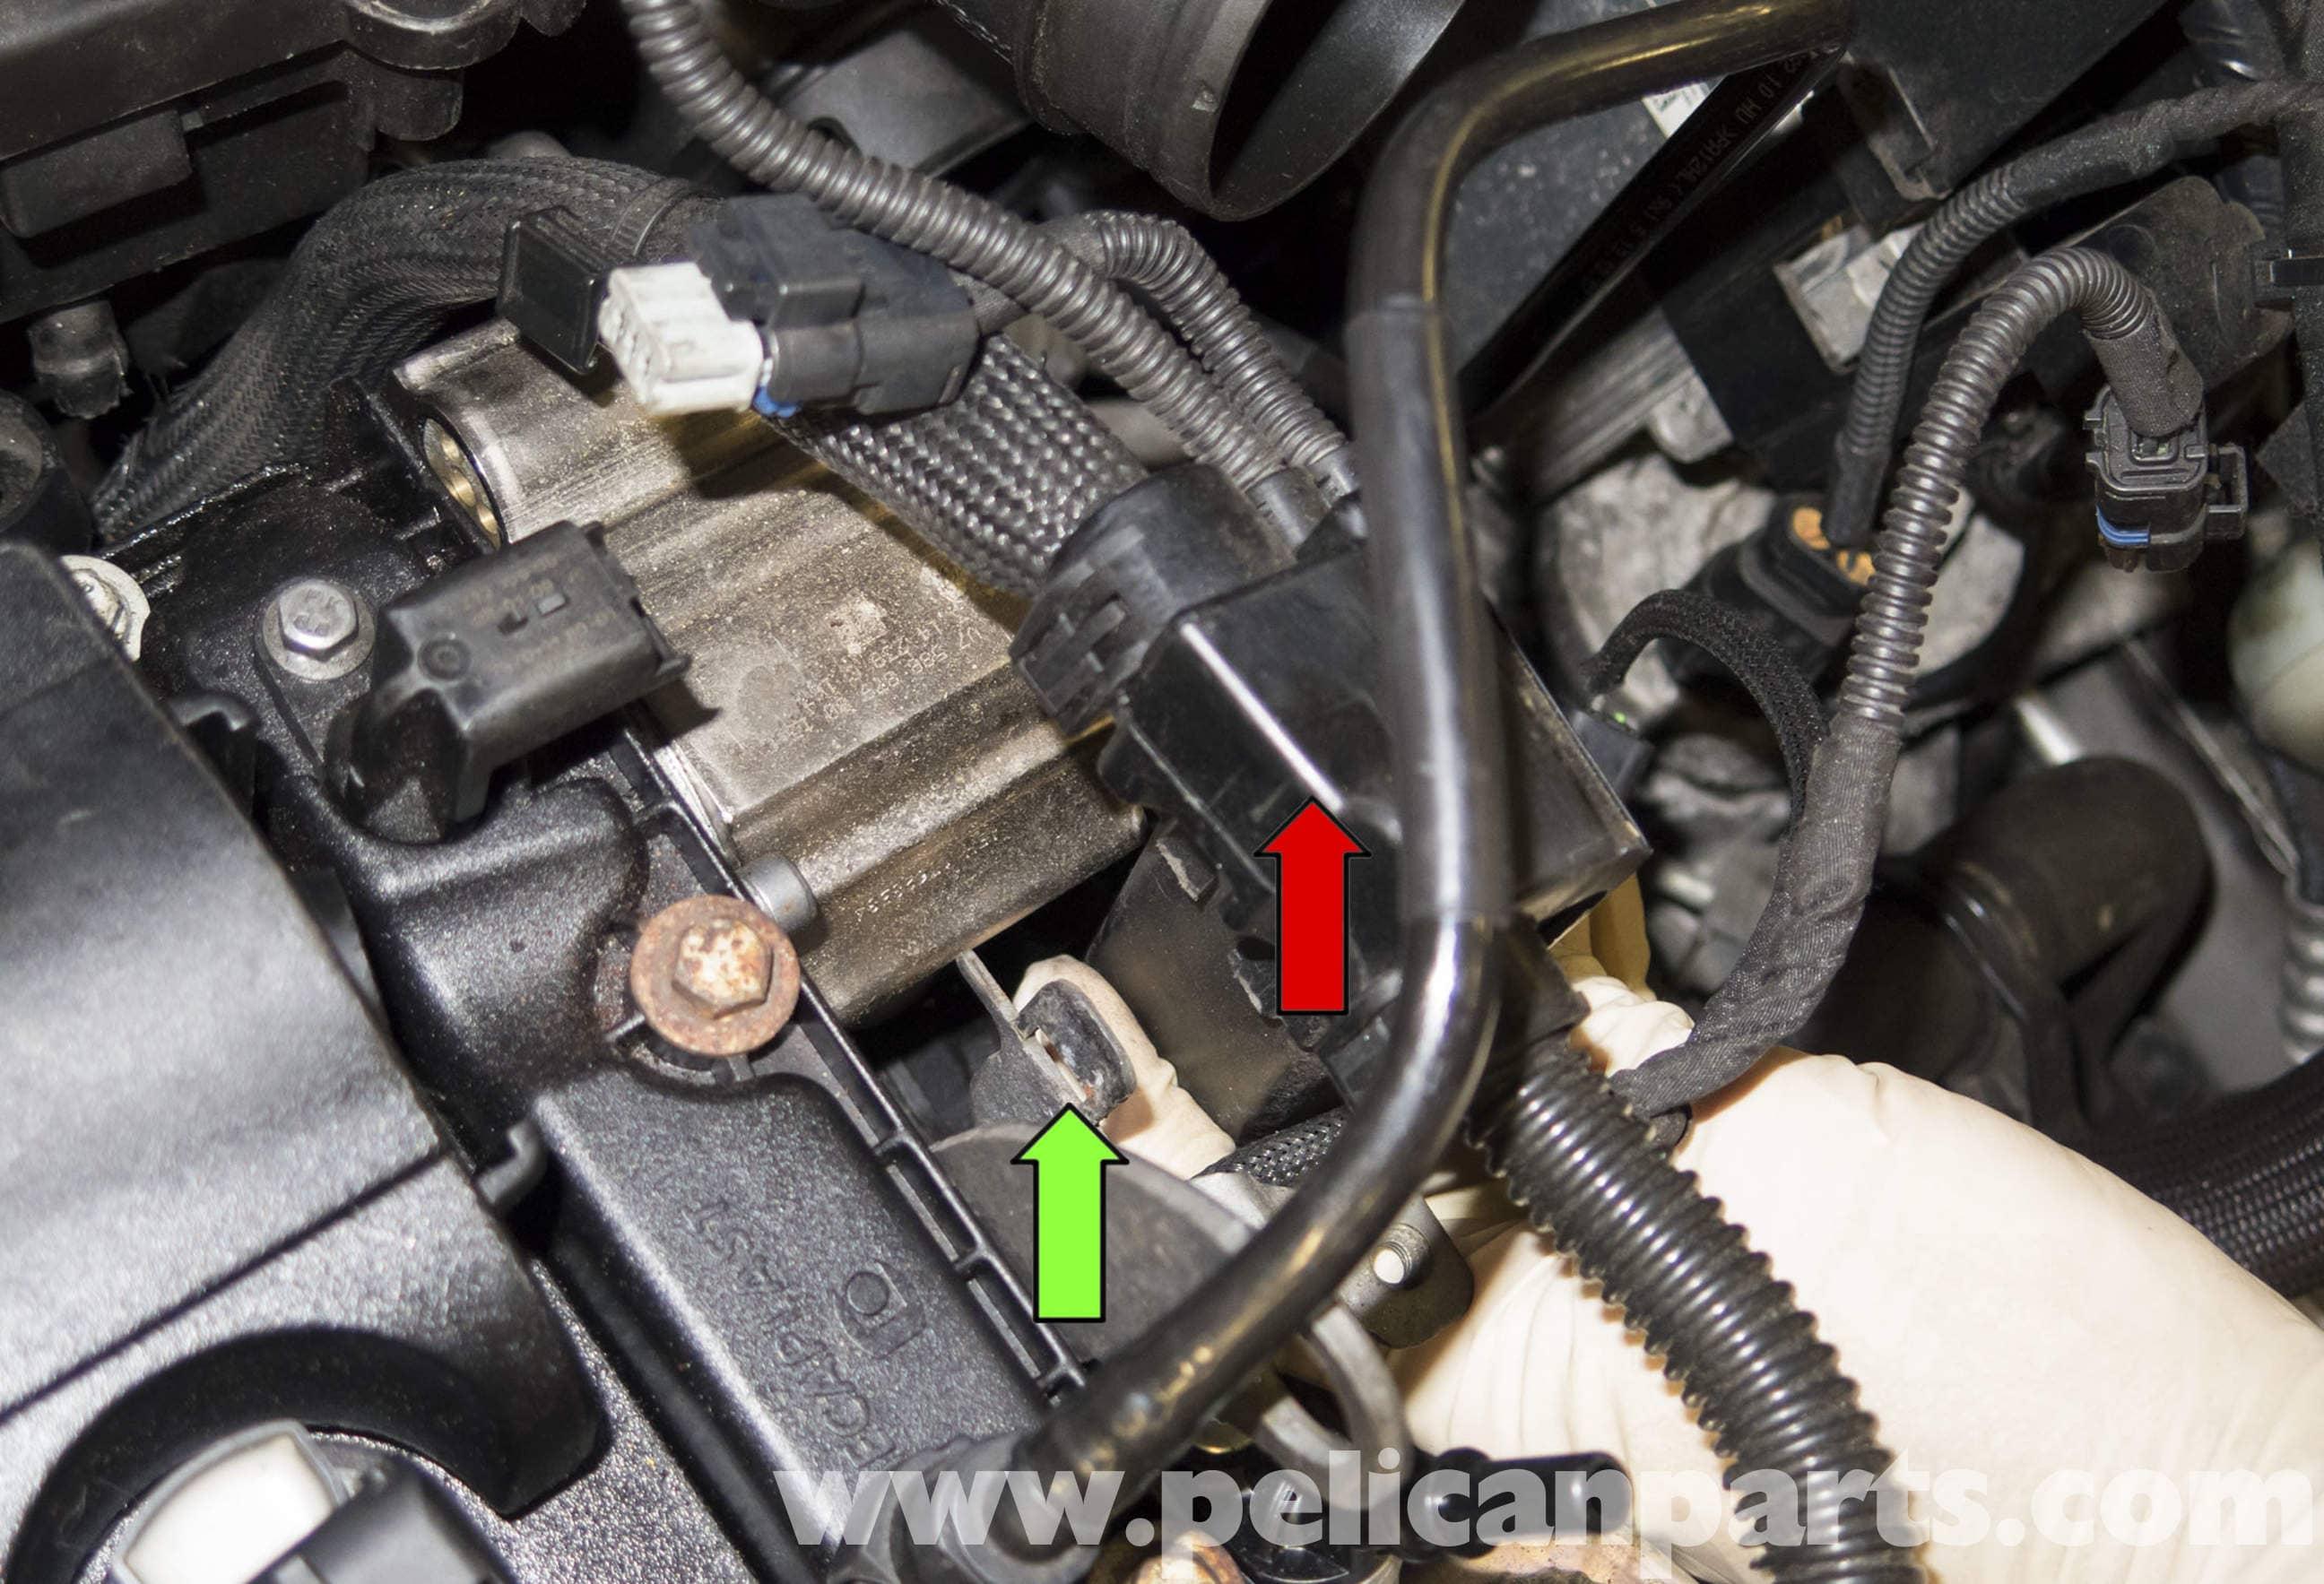 Ford 1600 Starter Wiring Diagram Mini Cooper R56 Coolant Temperature And Oil Pressure